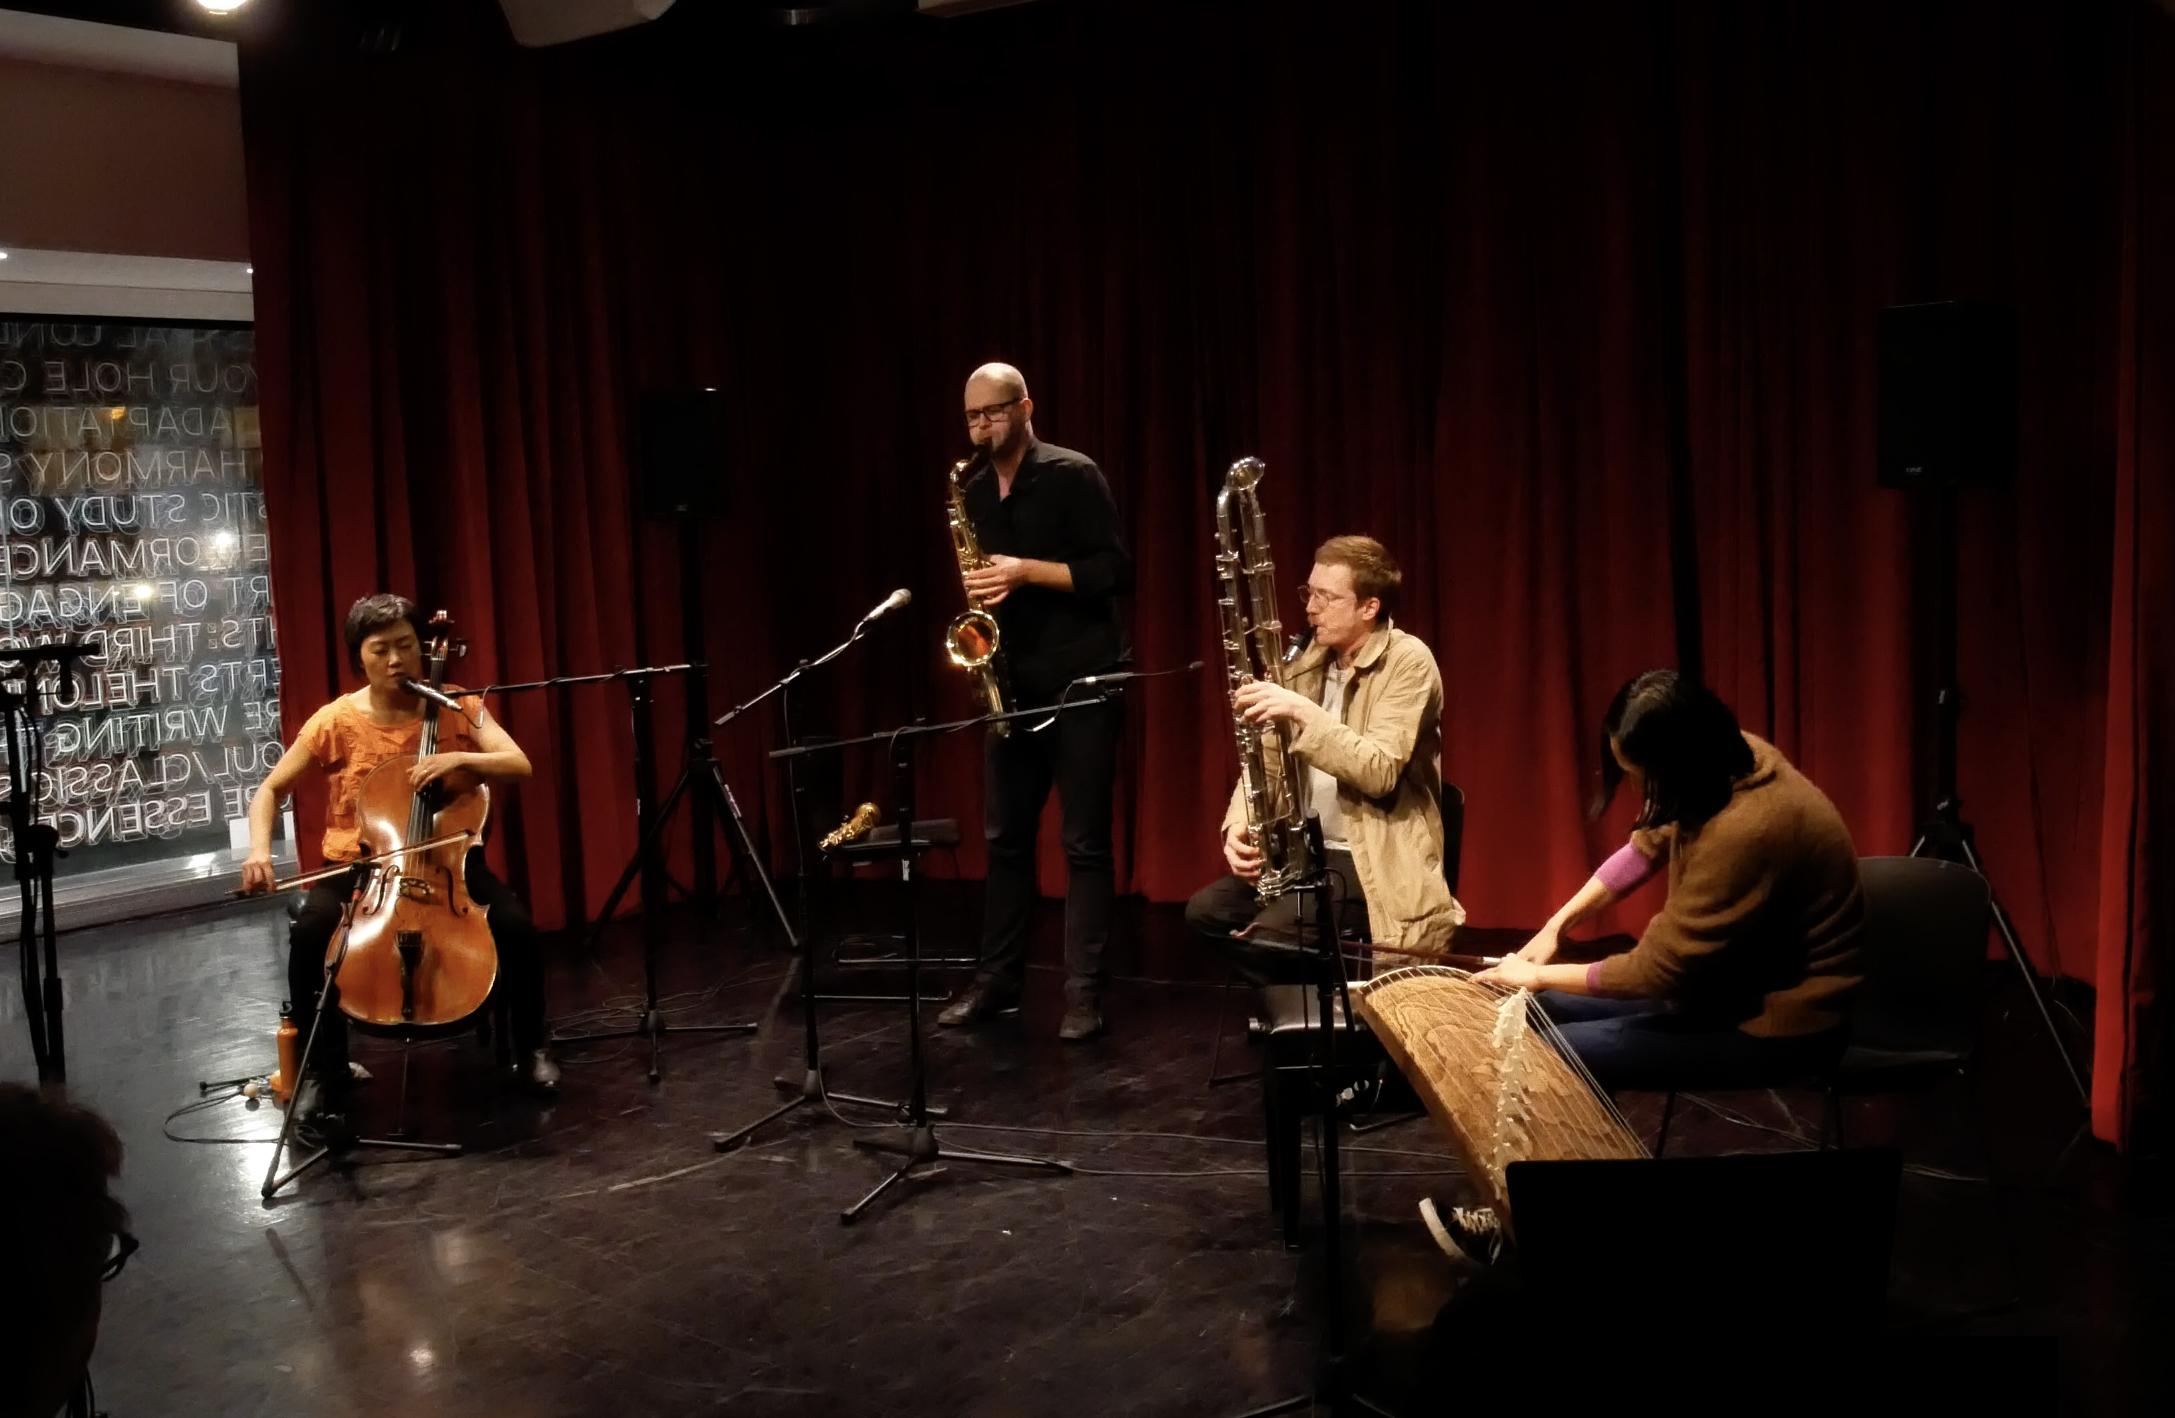 With Christian Kobi (sax), John McCowen (contrabass clarinet) and Kanoko Nishi-Smith (koto)